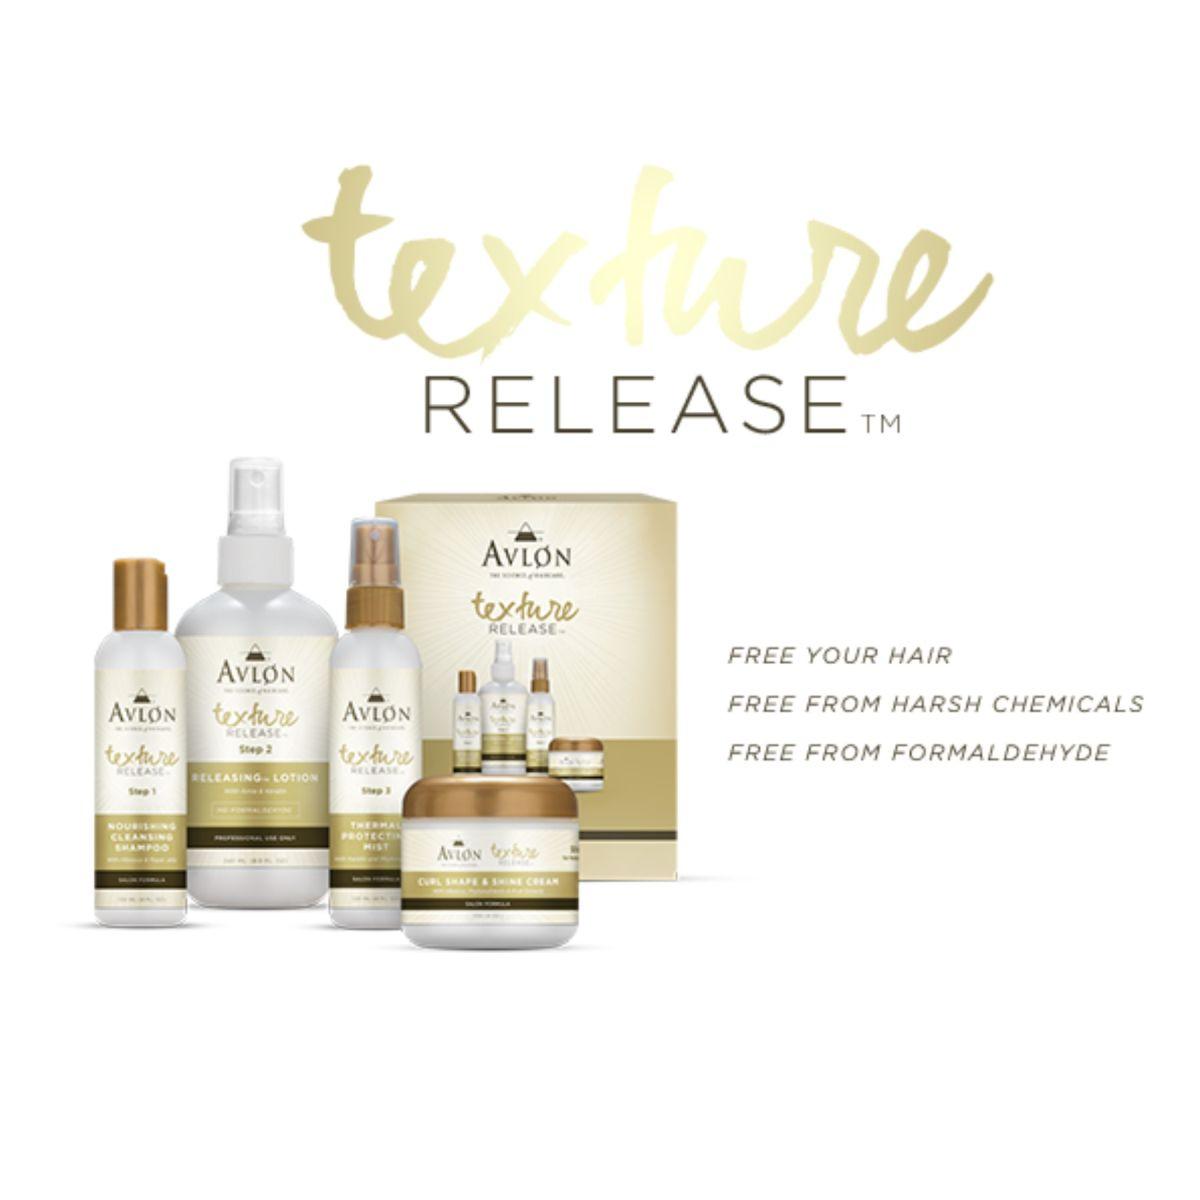 Avlon Affirm Texture Release Kit